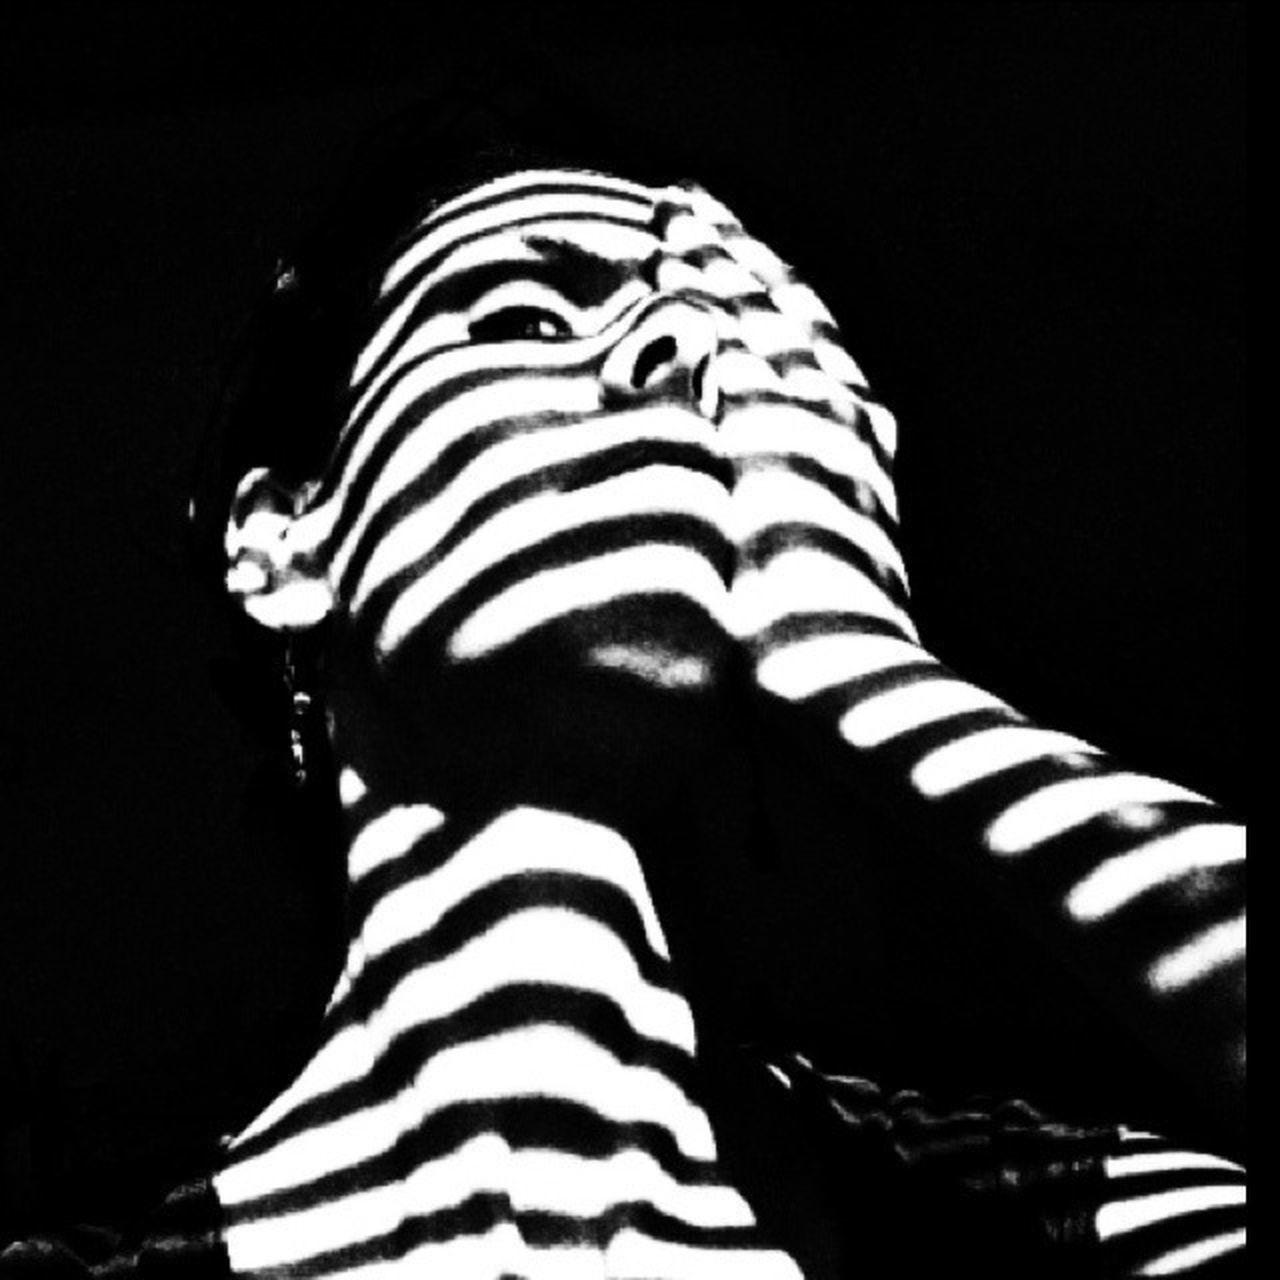 striped, zebra, black color, studio shot, pattern, one animal, no people, animal themes, black background, mammal, close-up, indoors, day